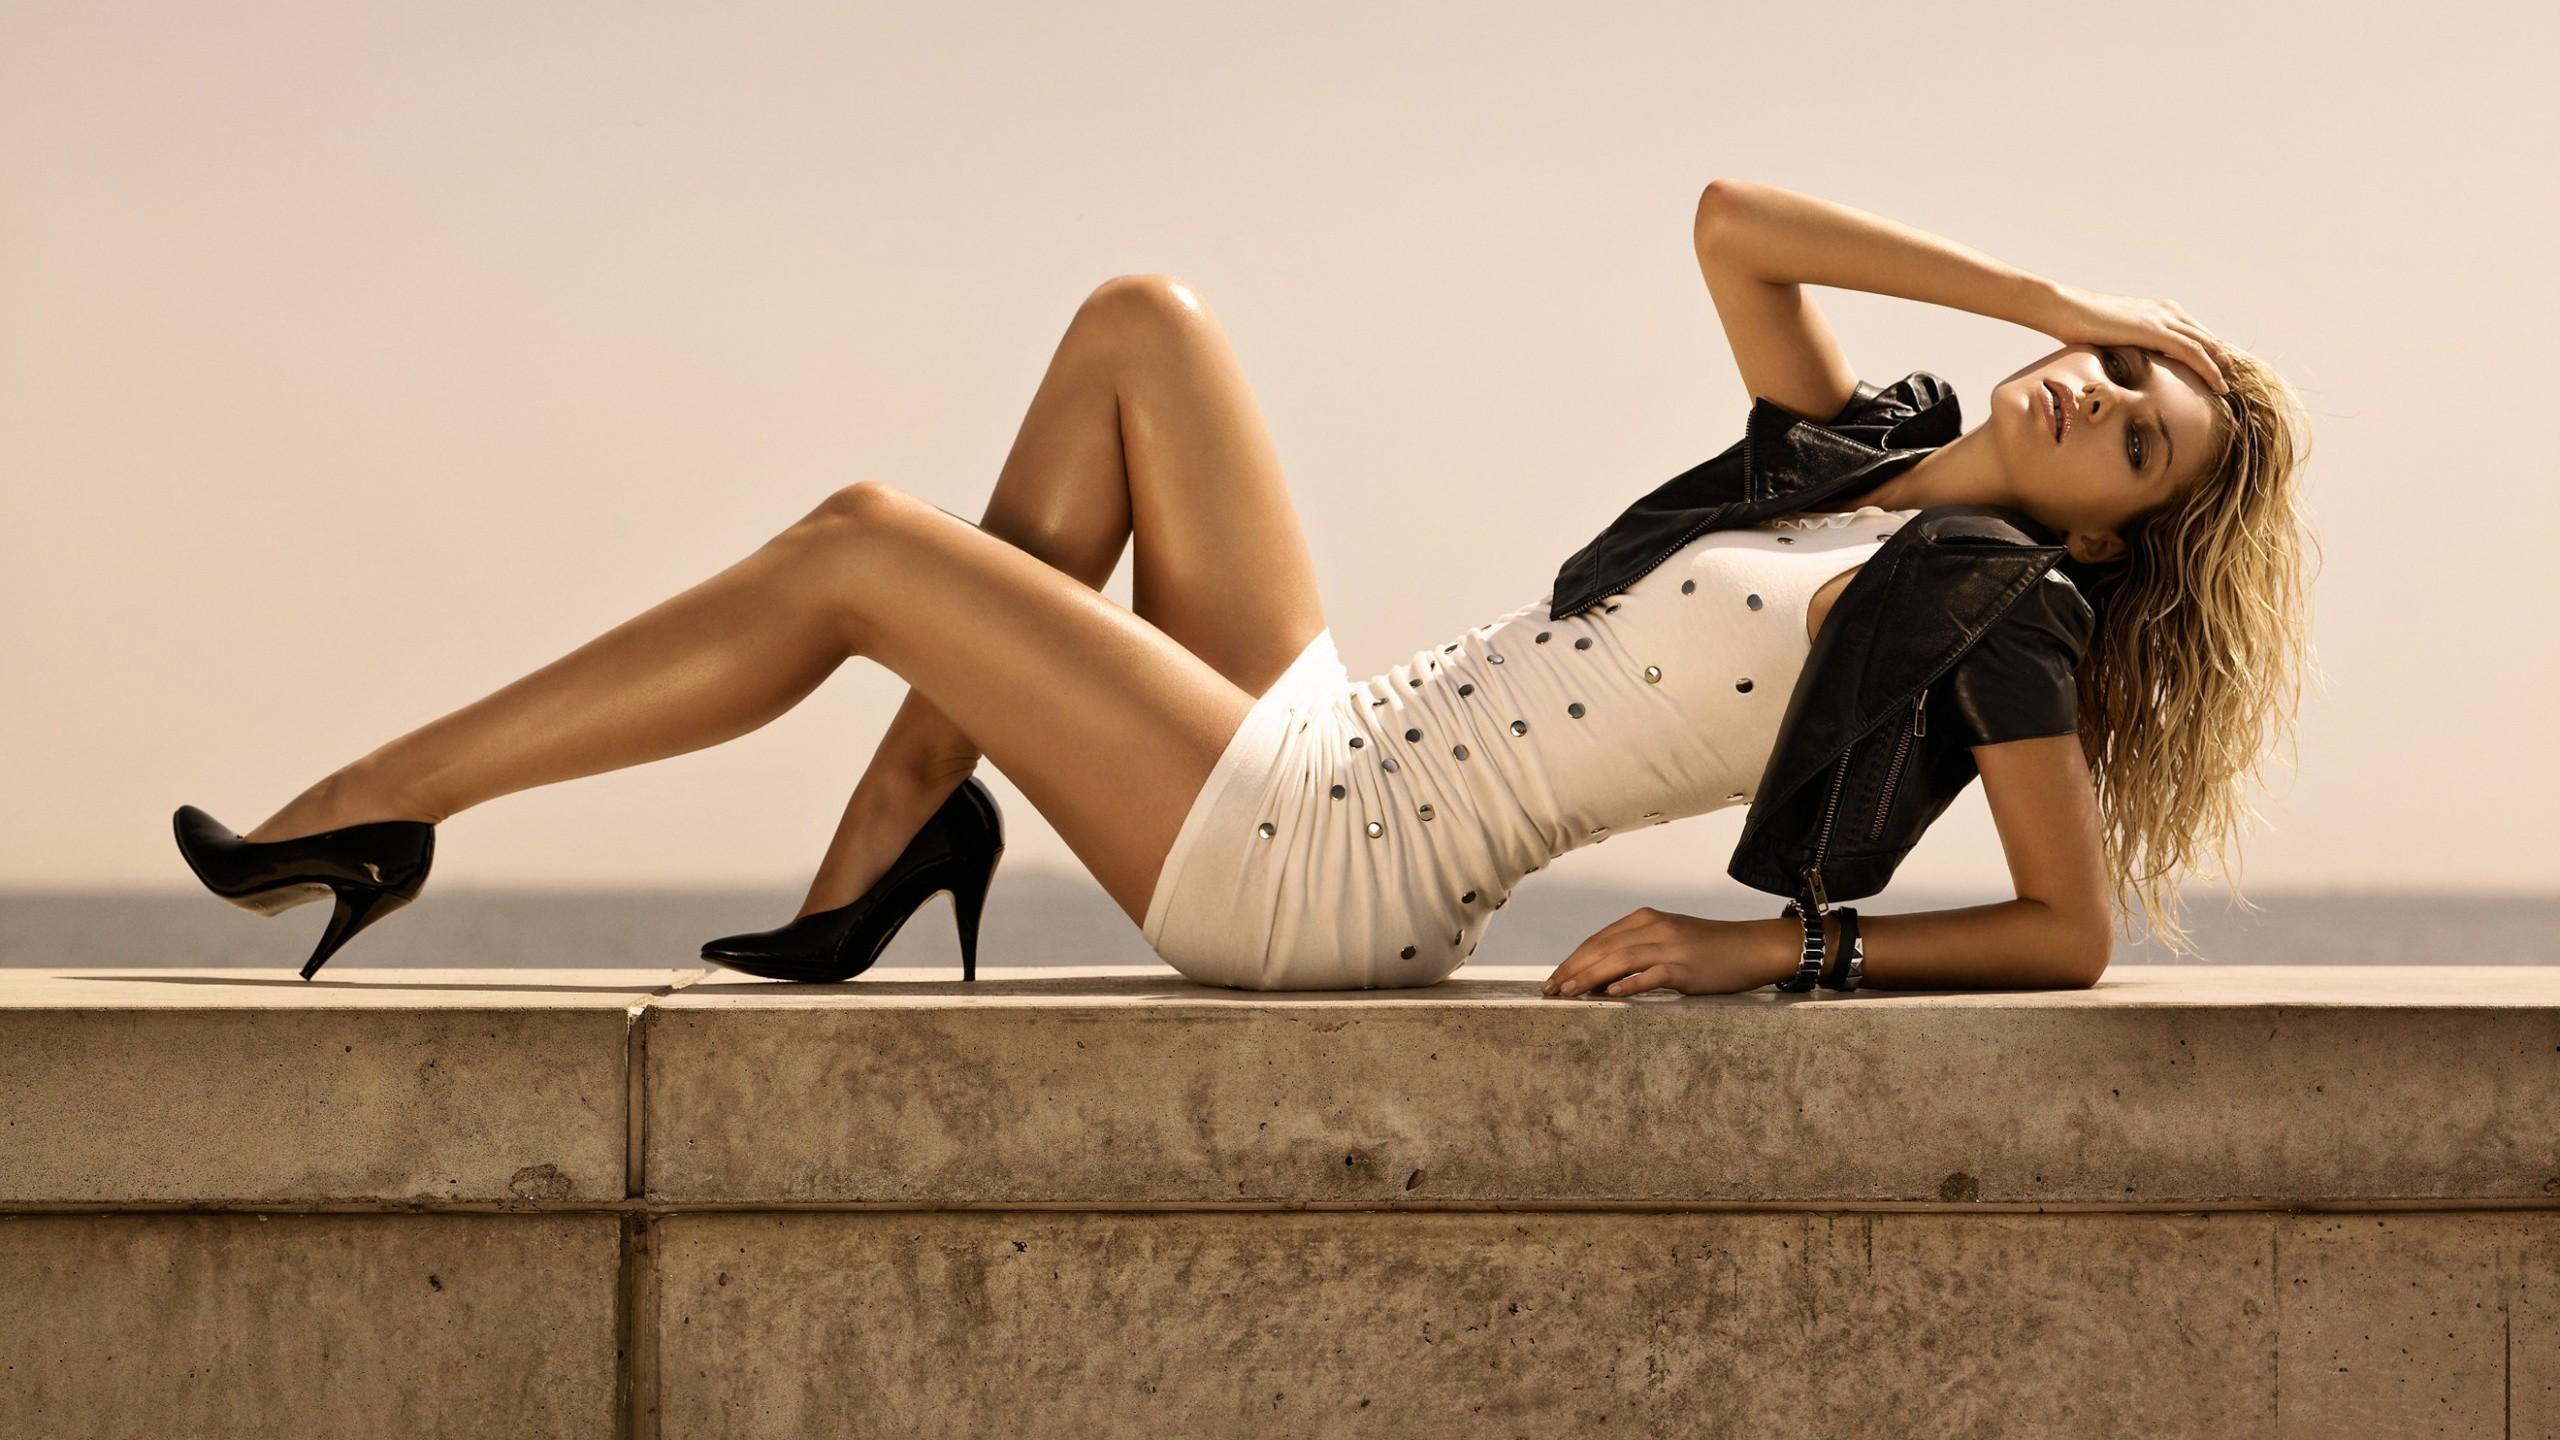 People 2560x1440 women Jessica Hart white dress blonde long hair minidress legs up tanned hand on face